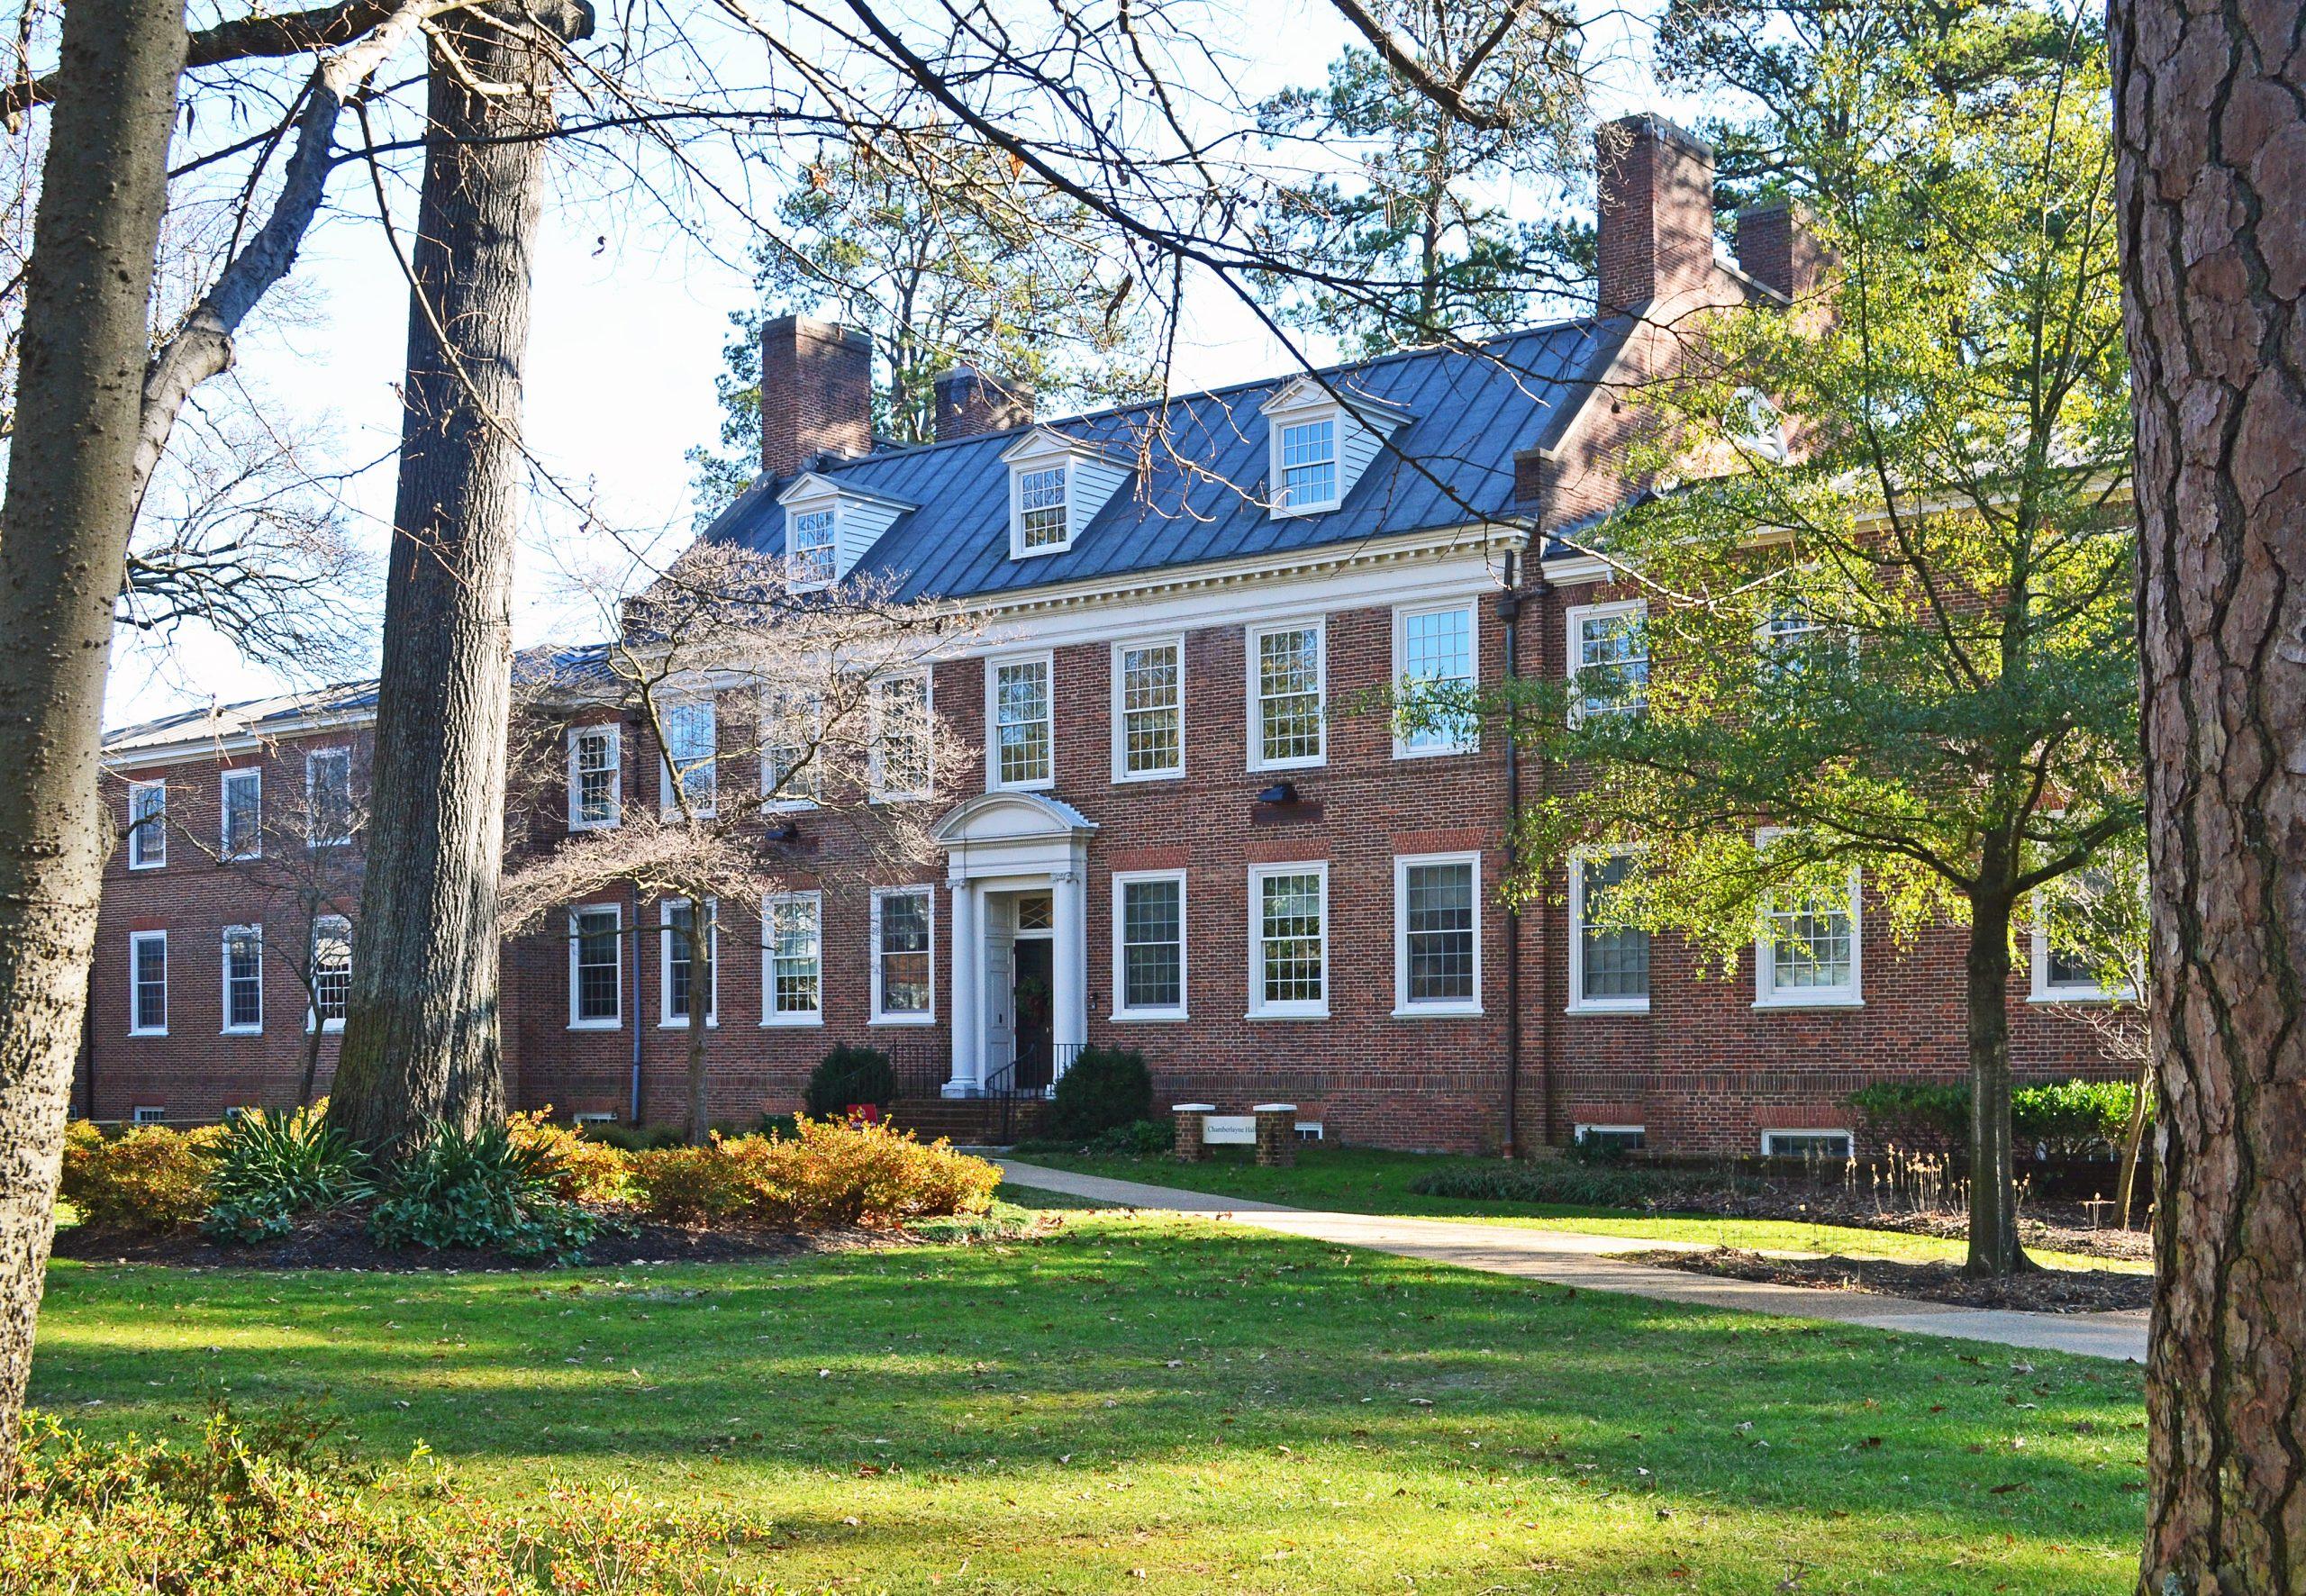 St. Christopher's School